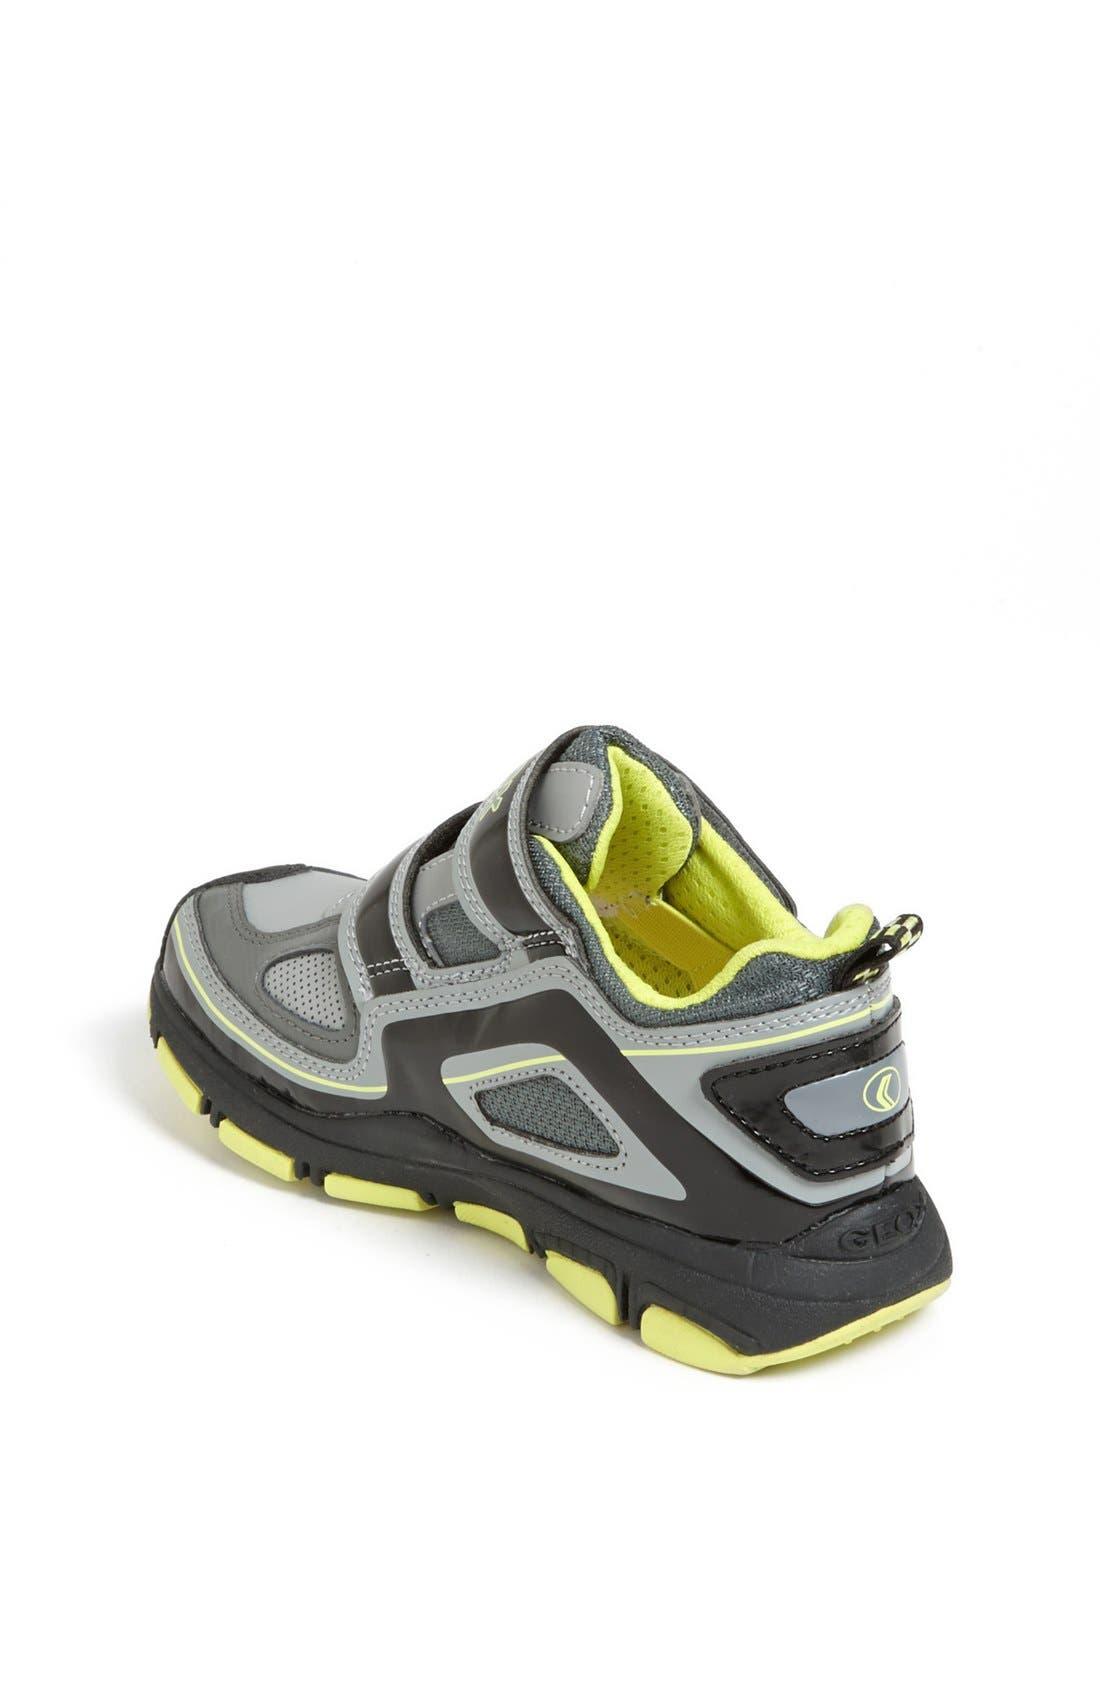 Alternate Image 2  - Geox 'Torque 4' Sneaker (Toddler, Little Kid & Big Kid)